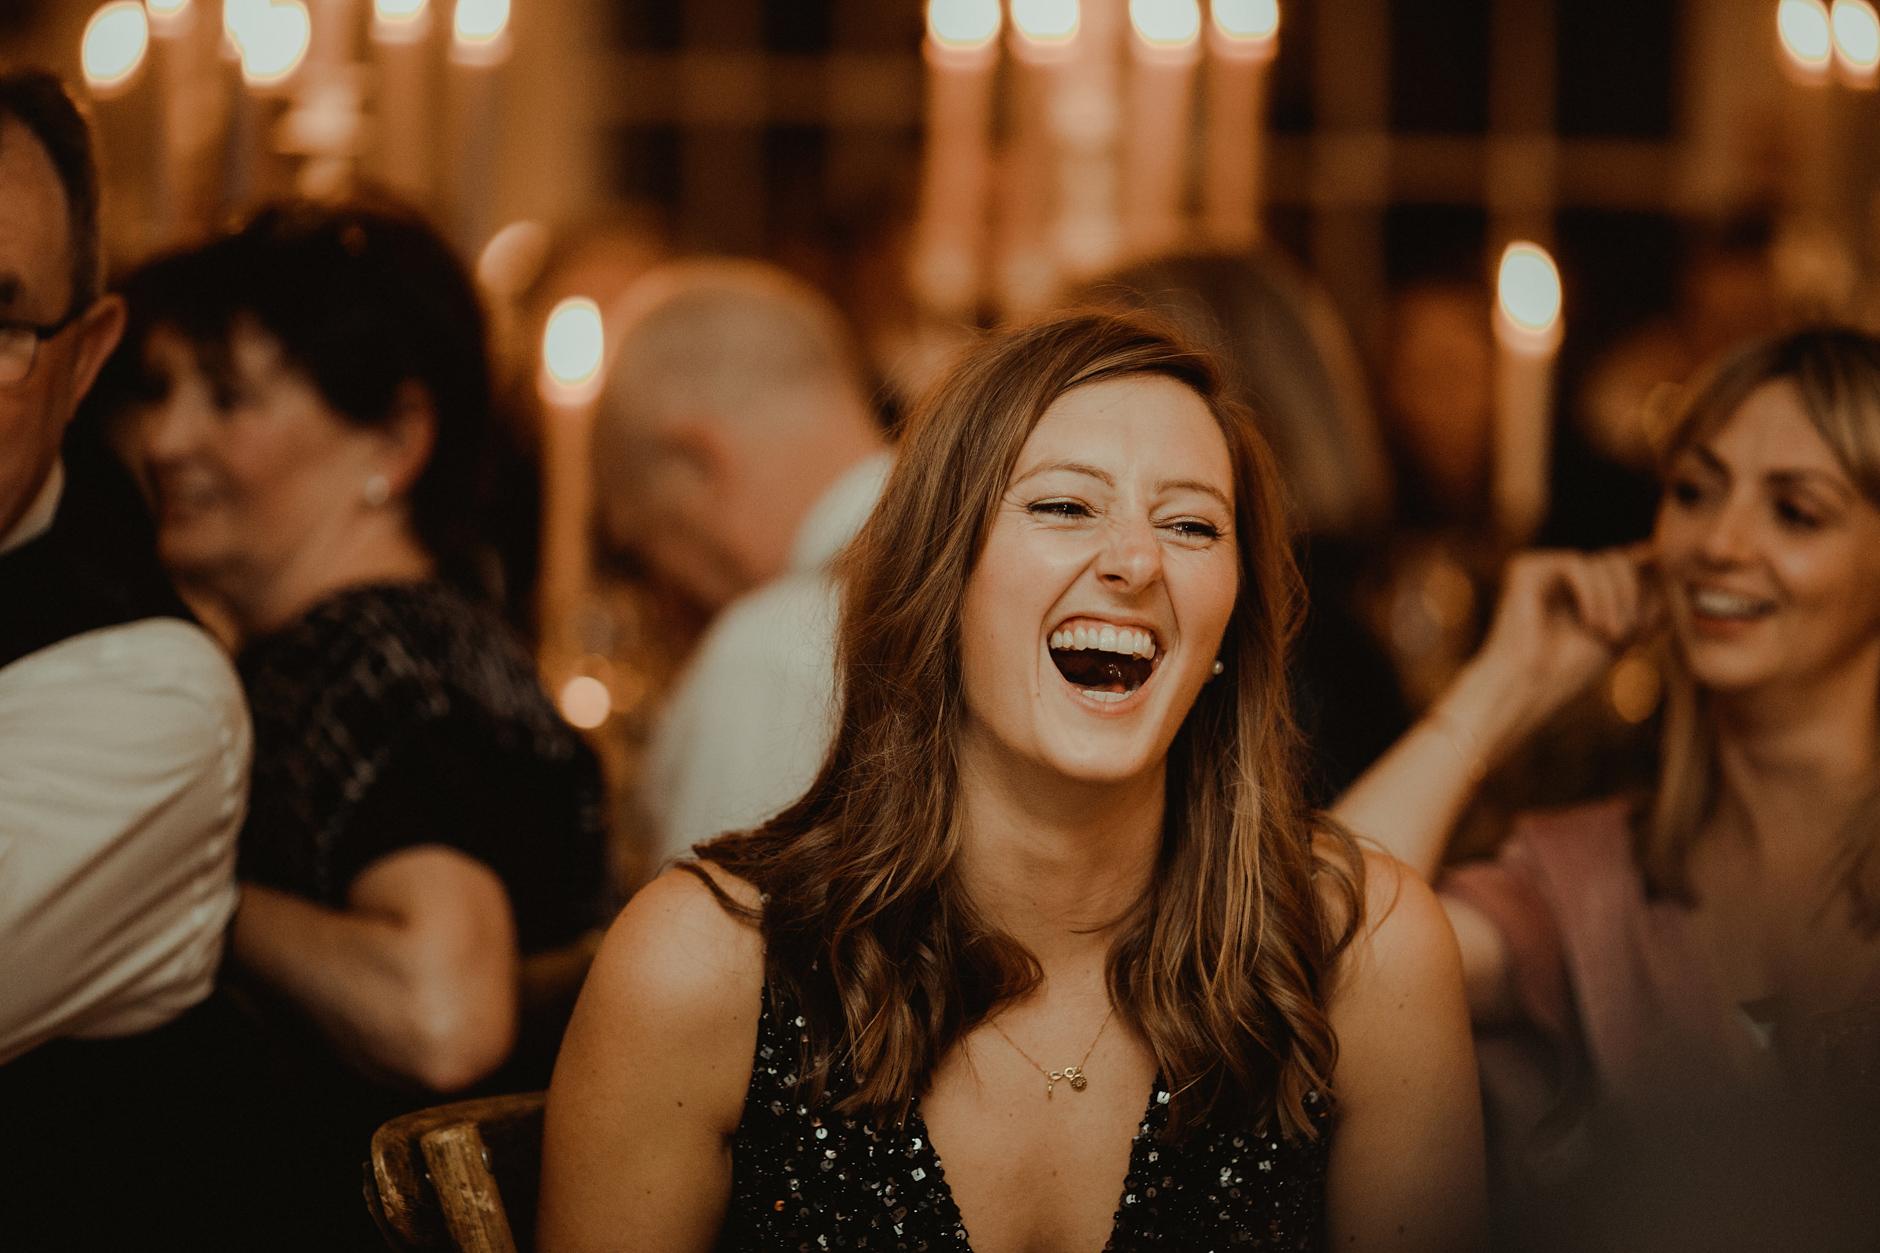 Glentruim-Wedding-Nikki-Leadbetter-Photography-278.jpg